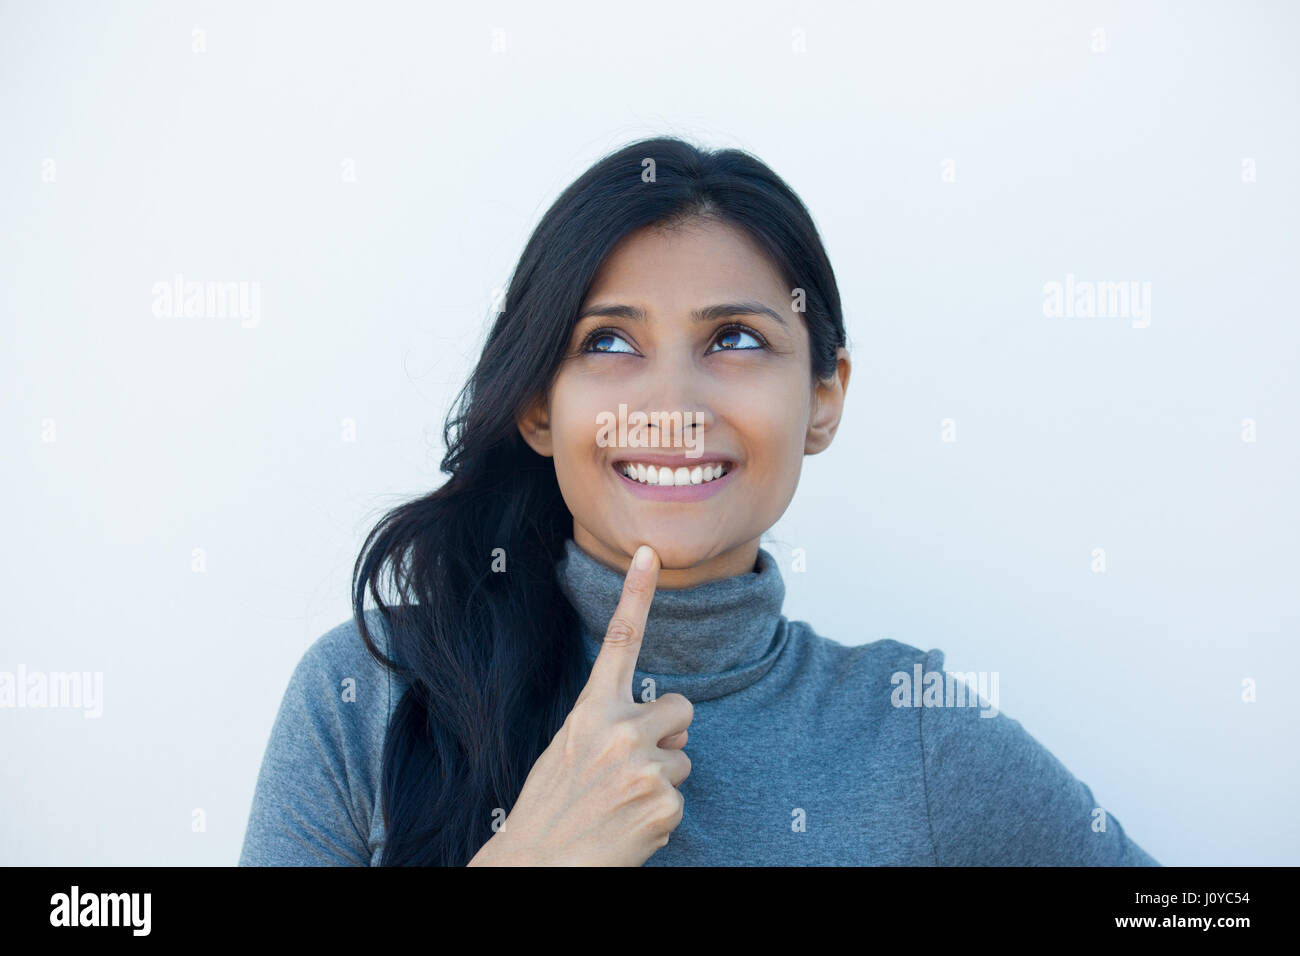 Closeup retrato, encantadora sonrisa optimista alegre feliz joven mirando hacia arriba soñar algo bonito, aislada Imagen De Stock